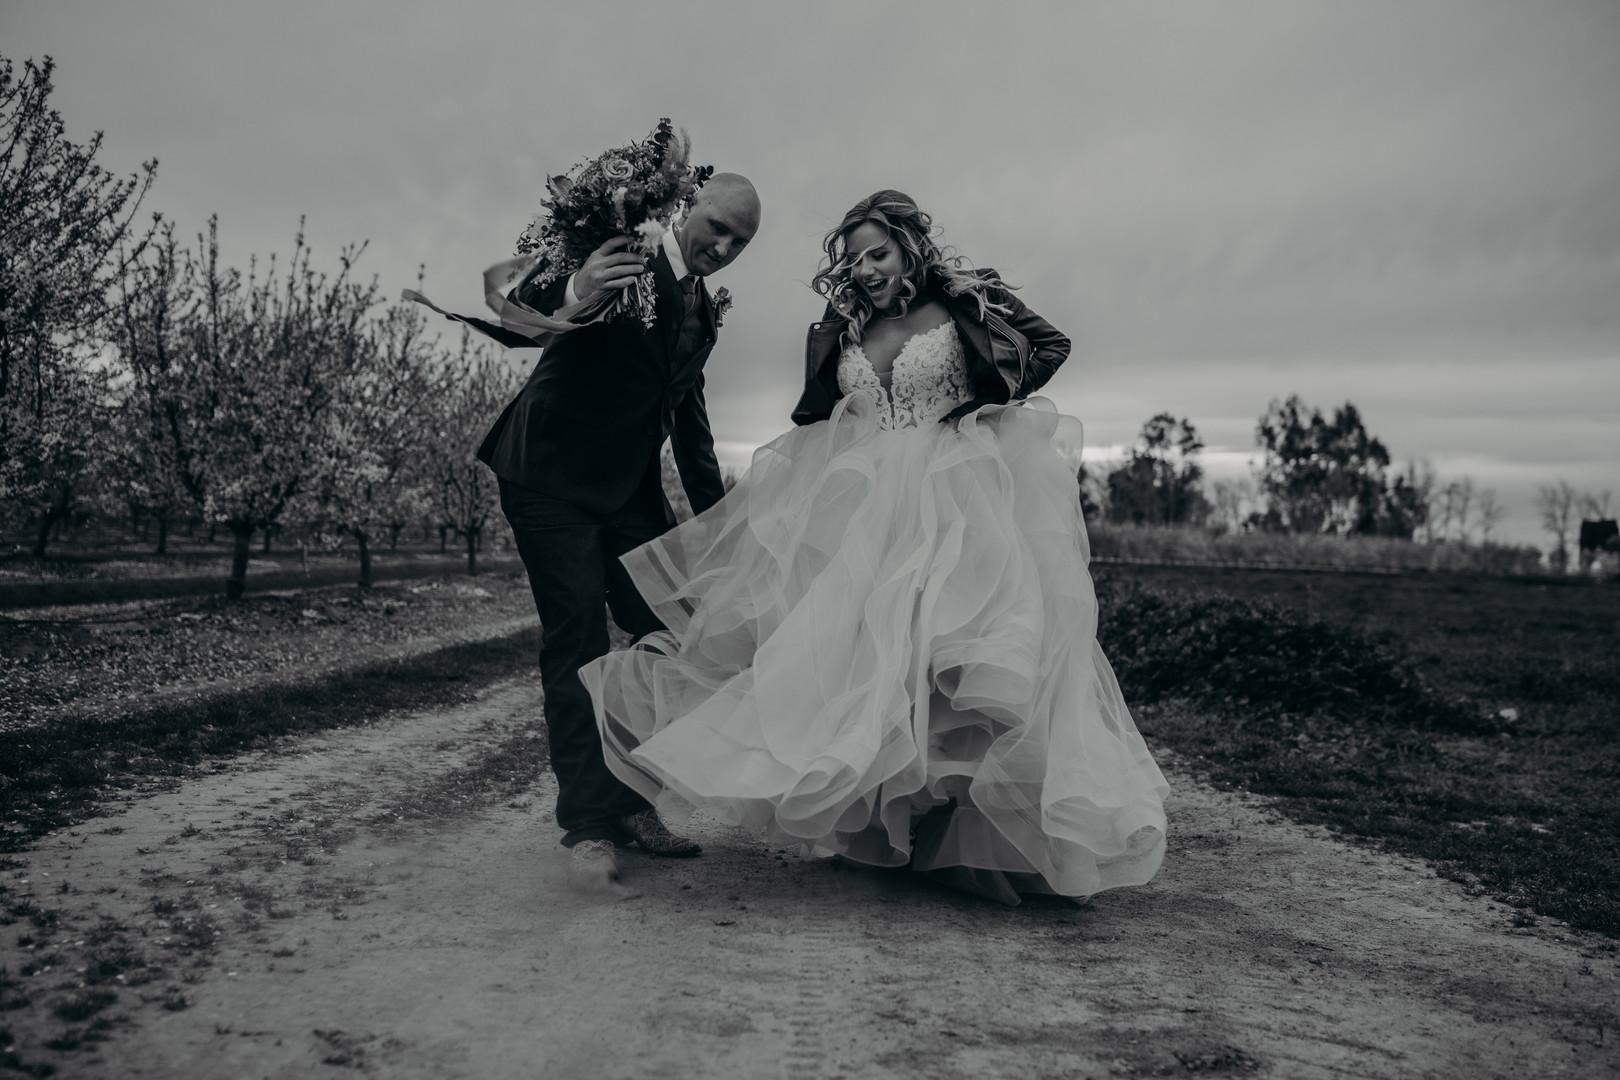 EDITORIAL_COUNTRY_MOODY_WEDDING_PRESERVE